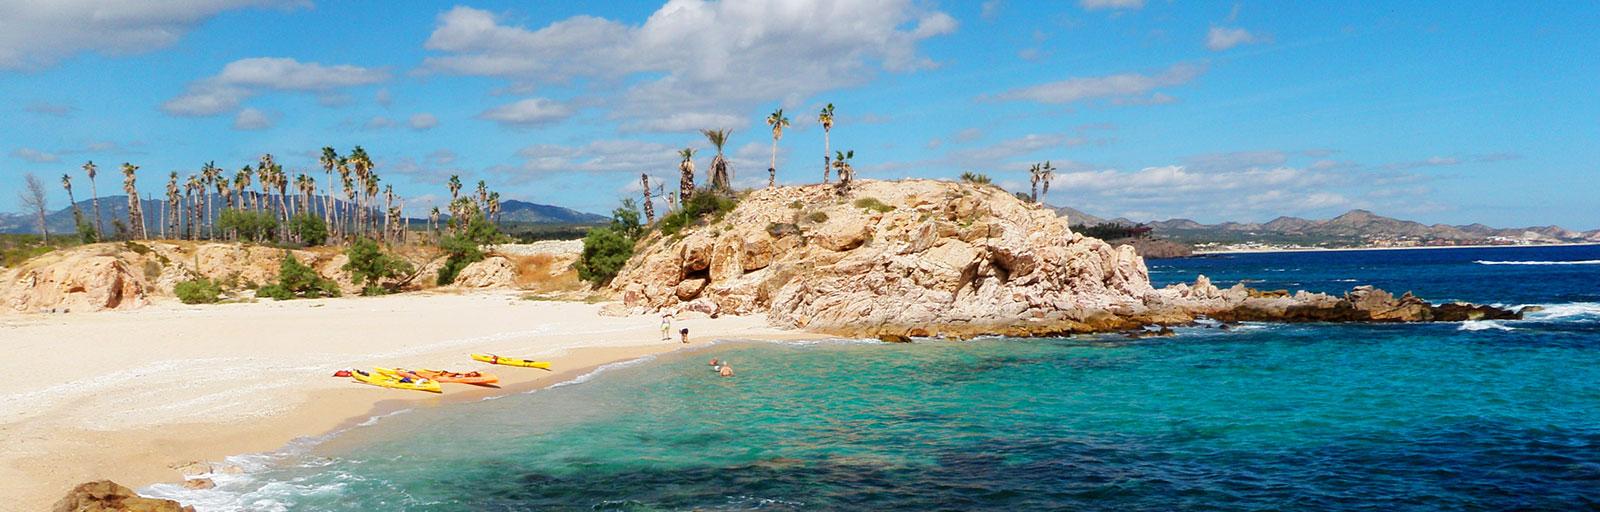 Sea Kayaking & Snorkeling on a Mexico Yoga Retreat: Golden Beach